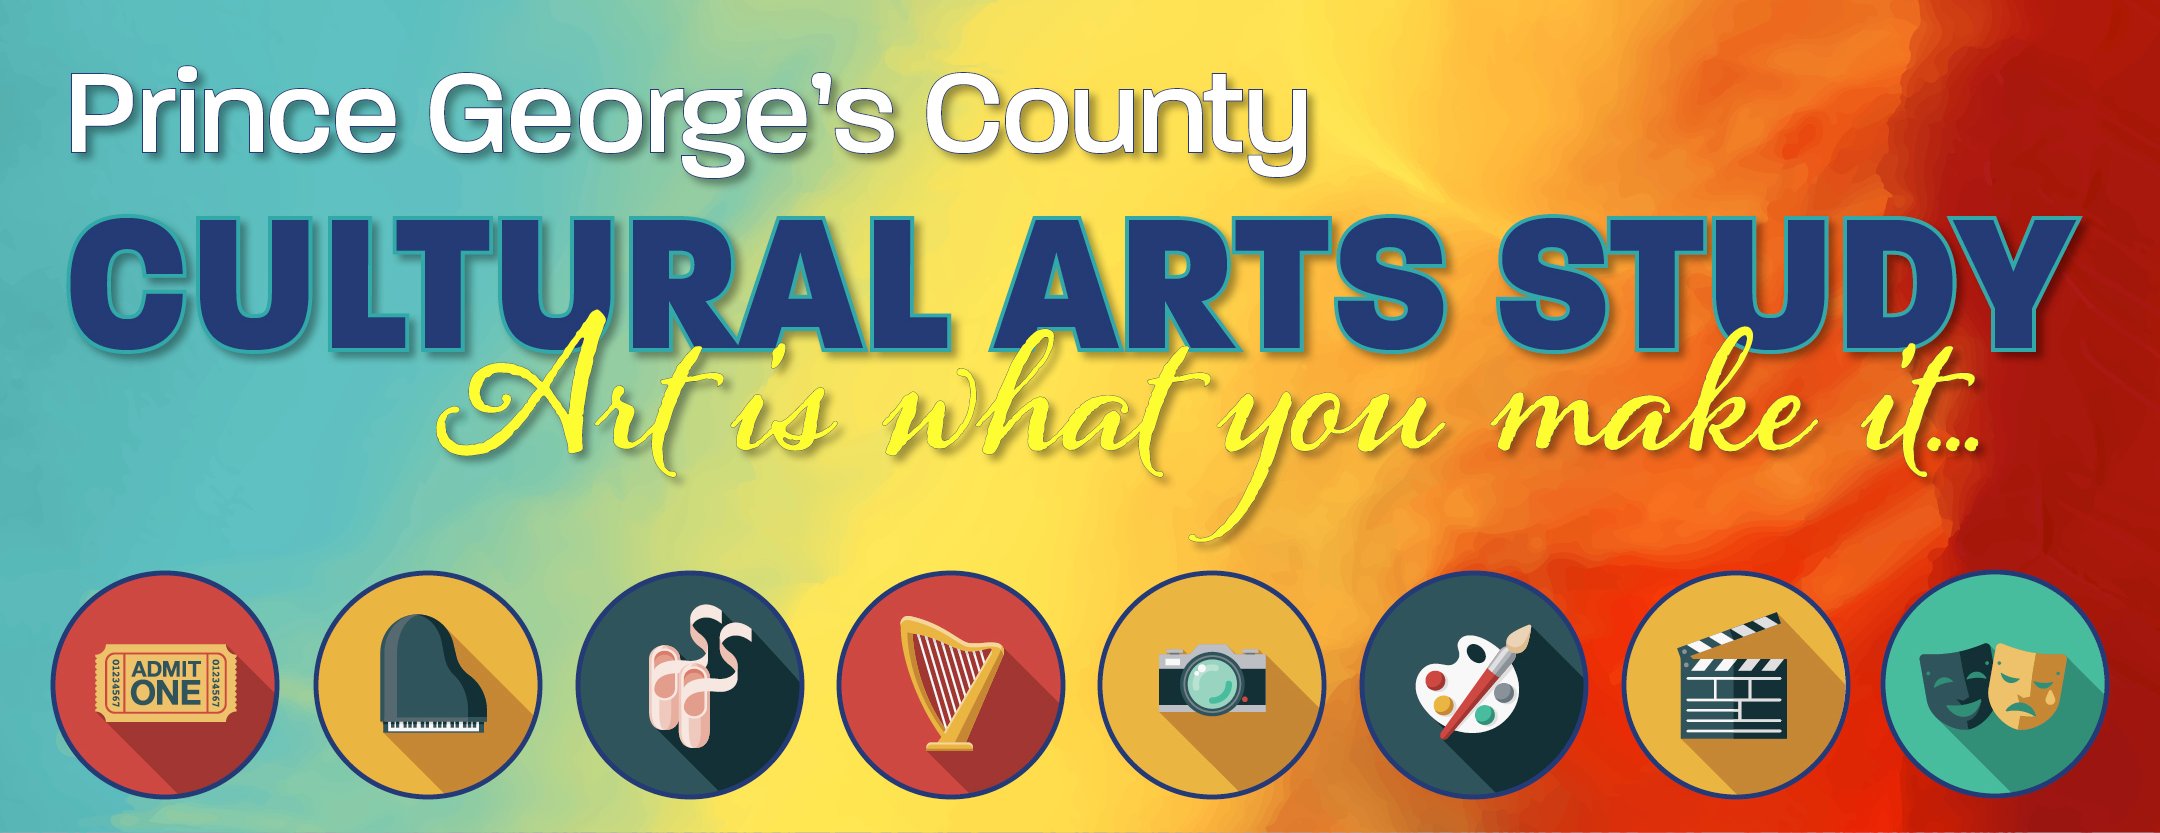 Prince George's County Cultural Arts Study Cu